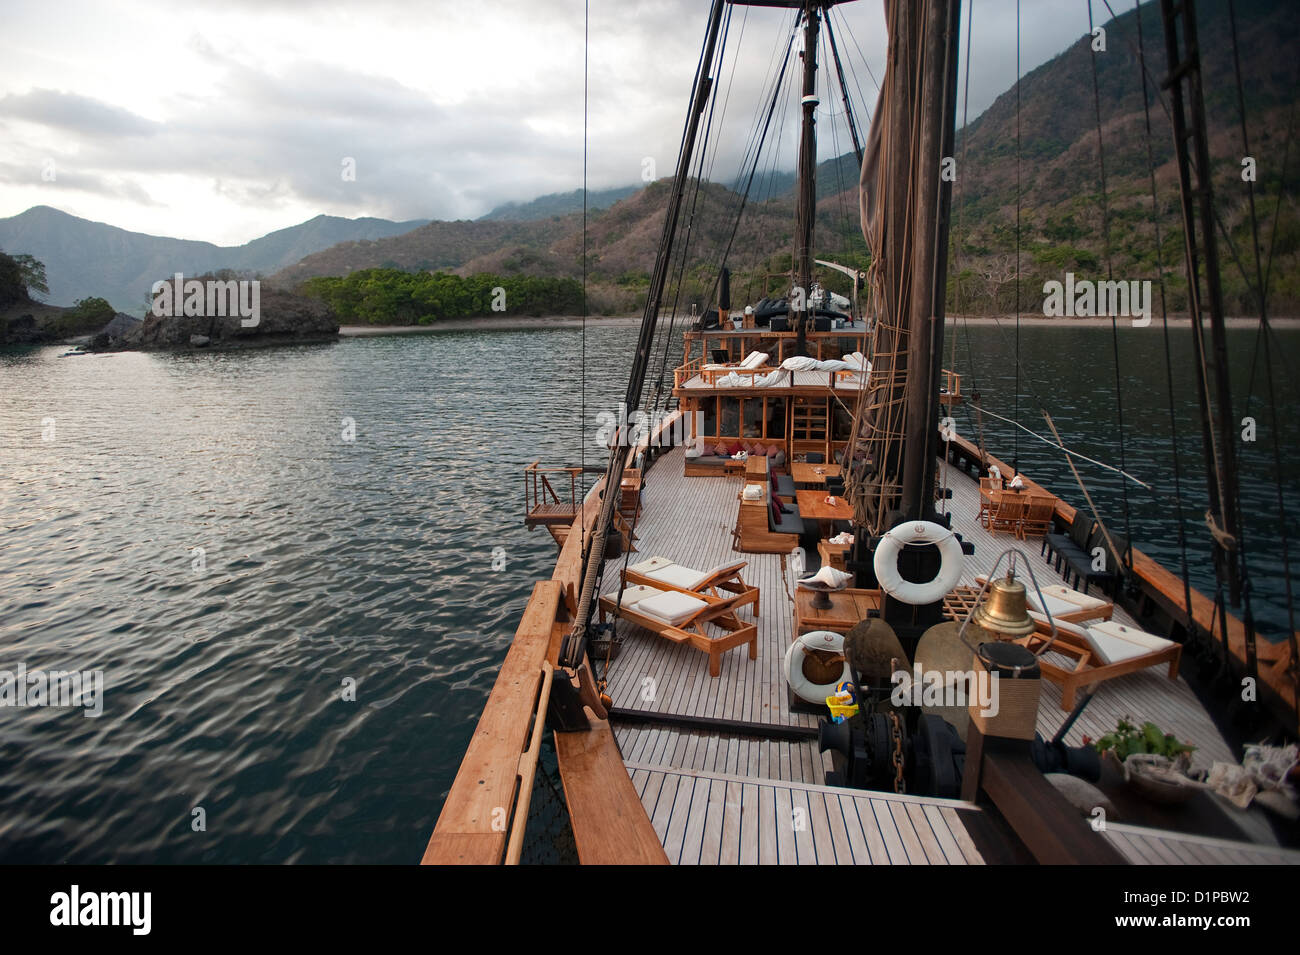 Silolona charter sailing boat in Rincha Island Komodo National Park Indonesia - Stock Image